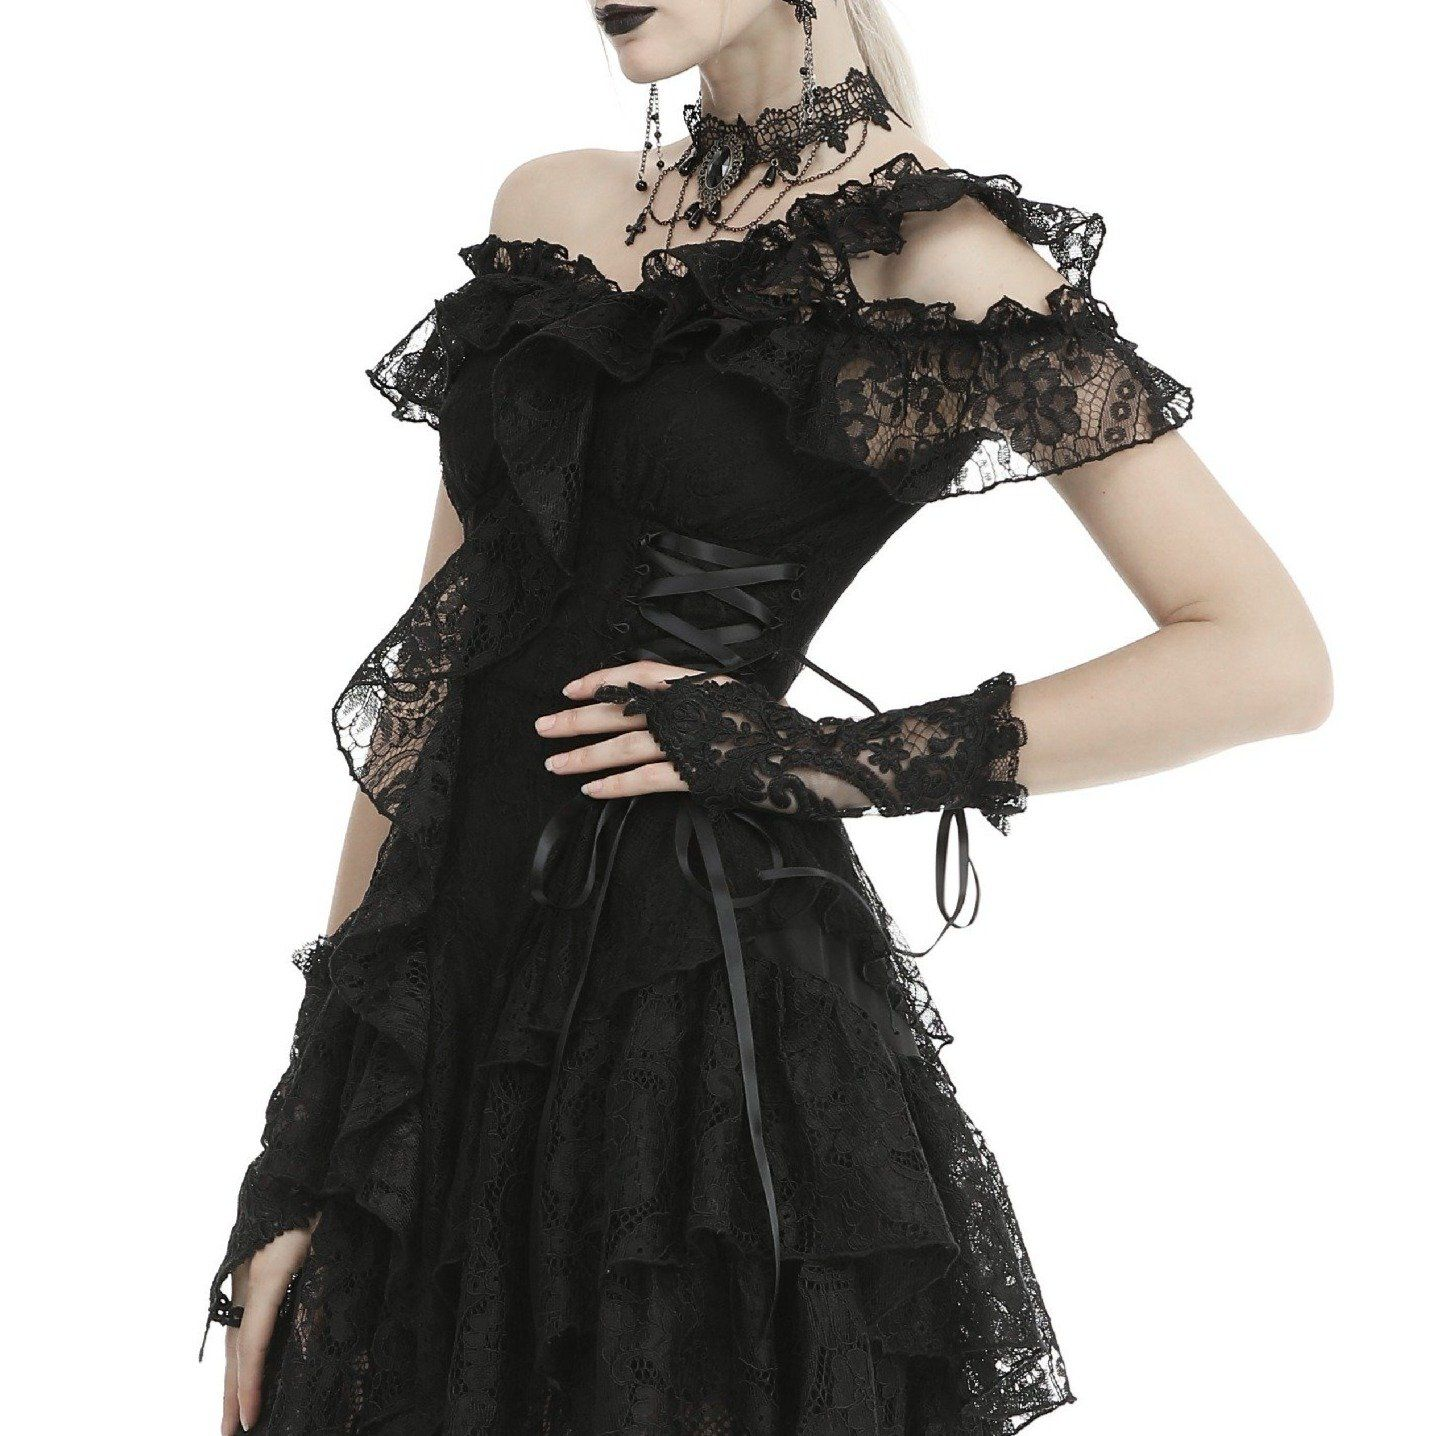 Nocturne Lace Gloves Victorian Goth Dress Lace Gloves Elegant Goth [ 1436 x 1436 Pixel ]